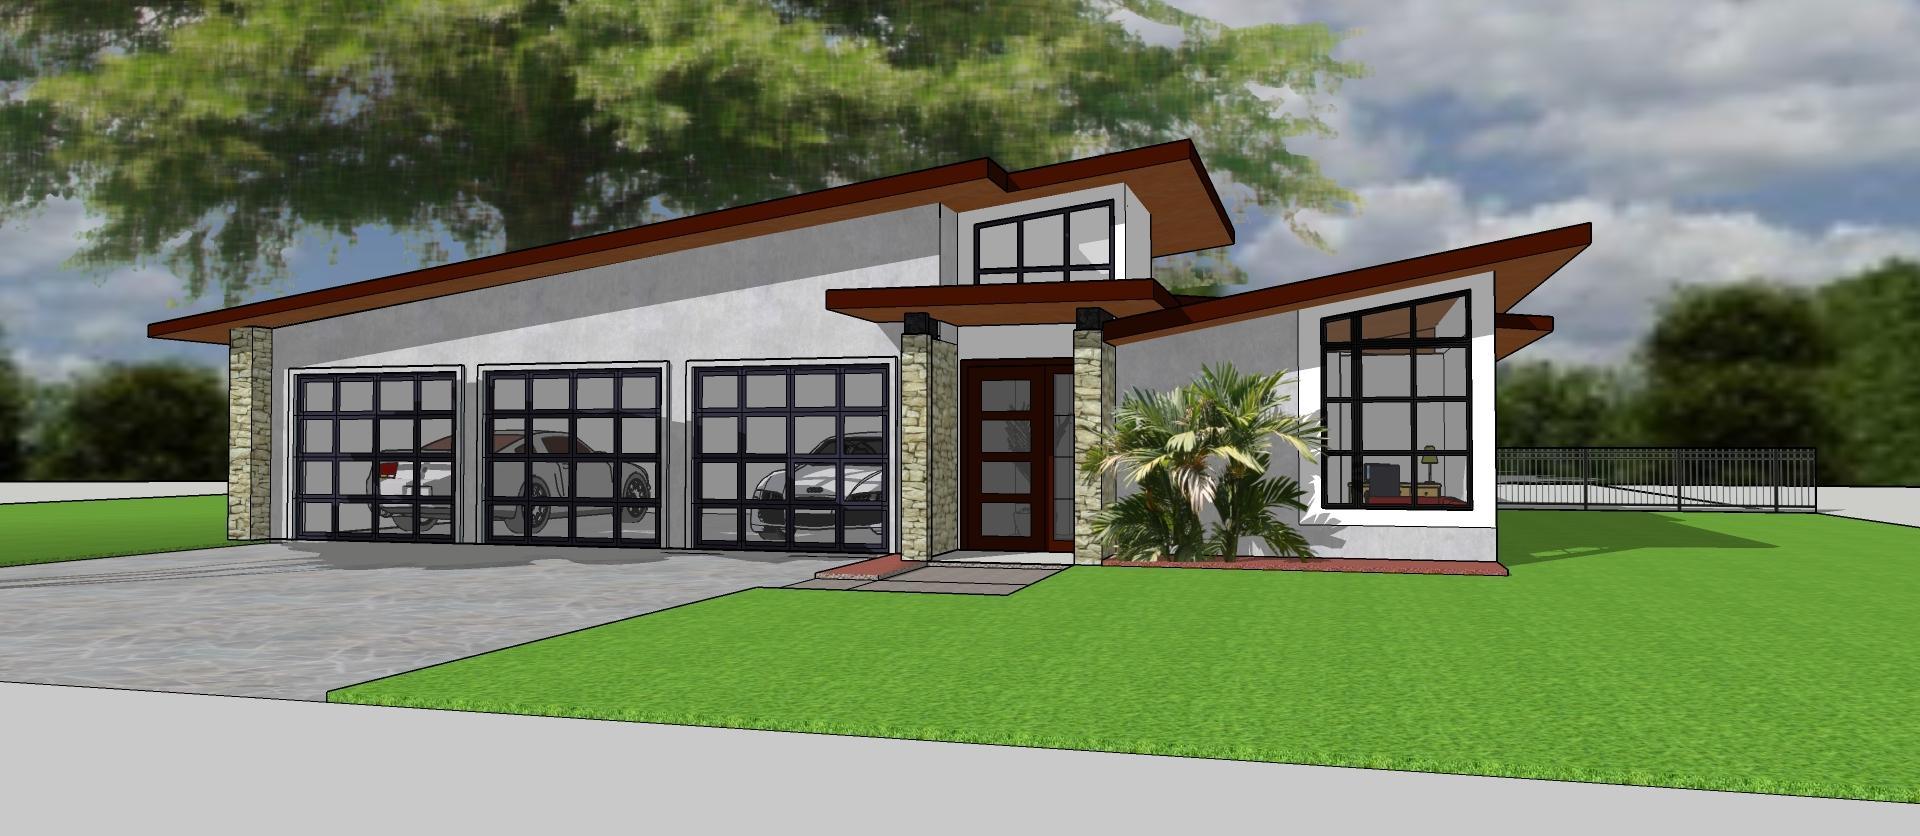 15 Urraca Street NW Property Photo - Albuquerque, NM real estate listing